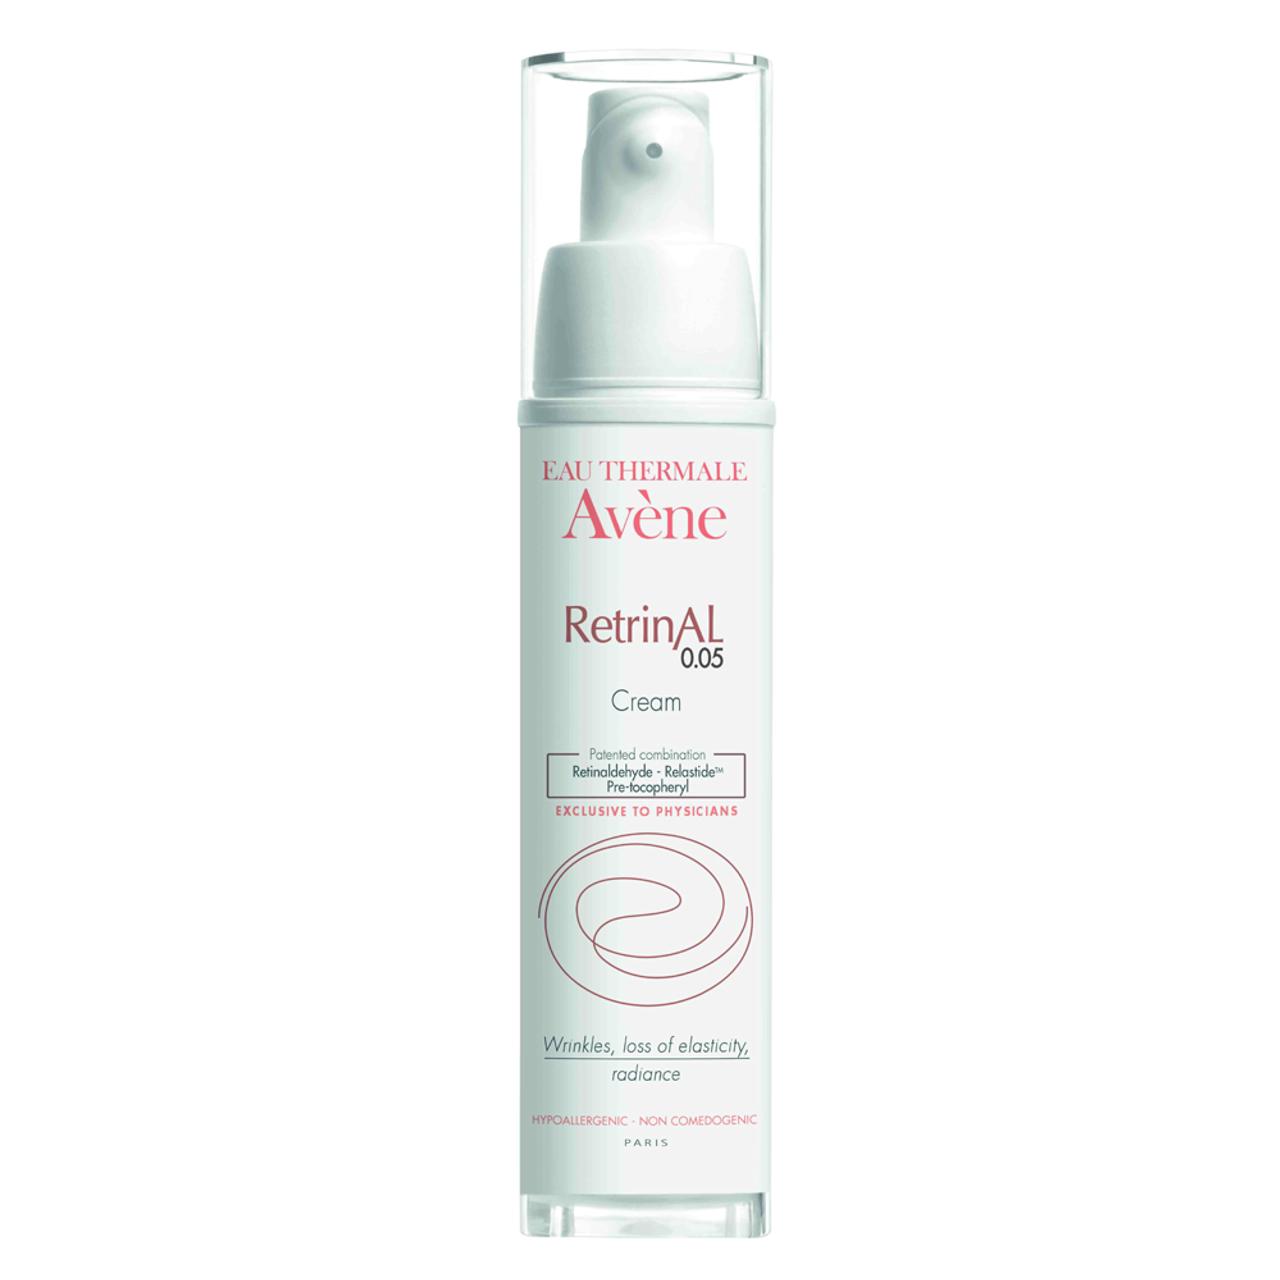 Avene RetrinAL Cream 0.05%